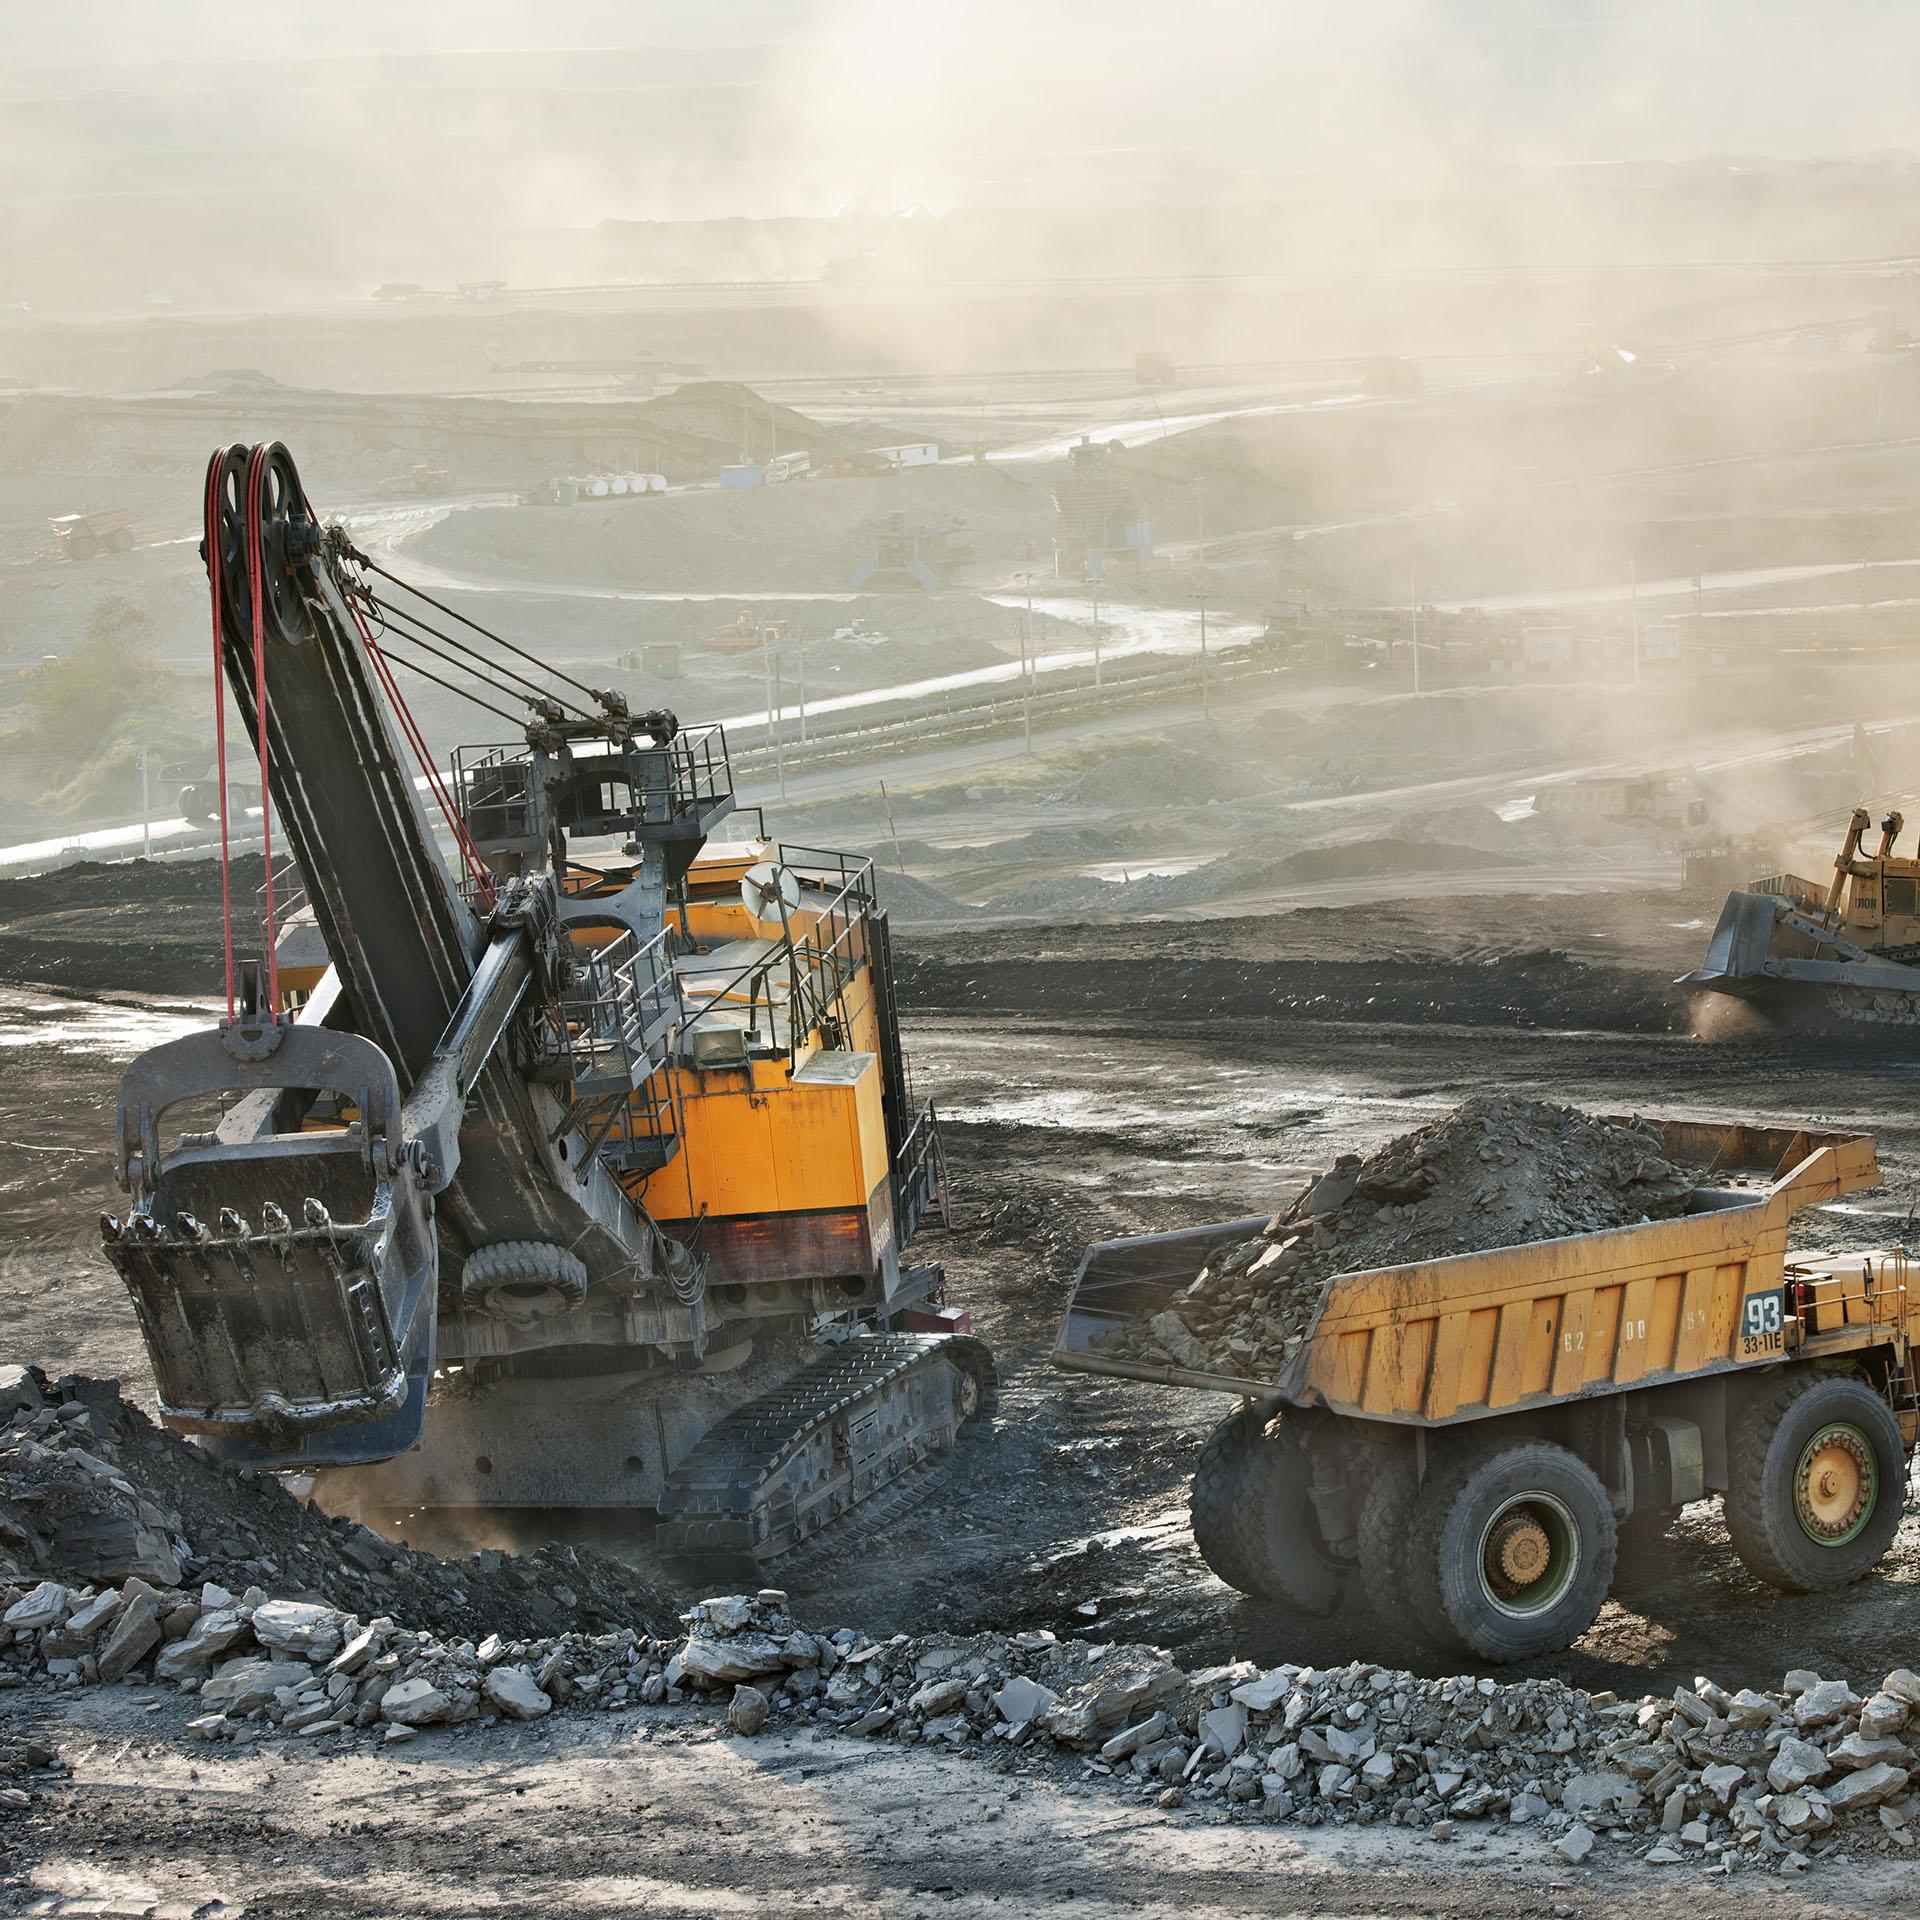 Mining excavation